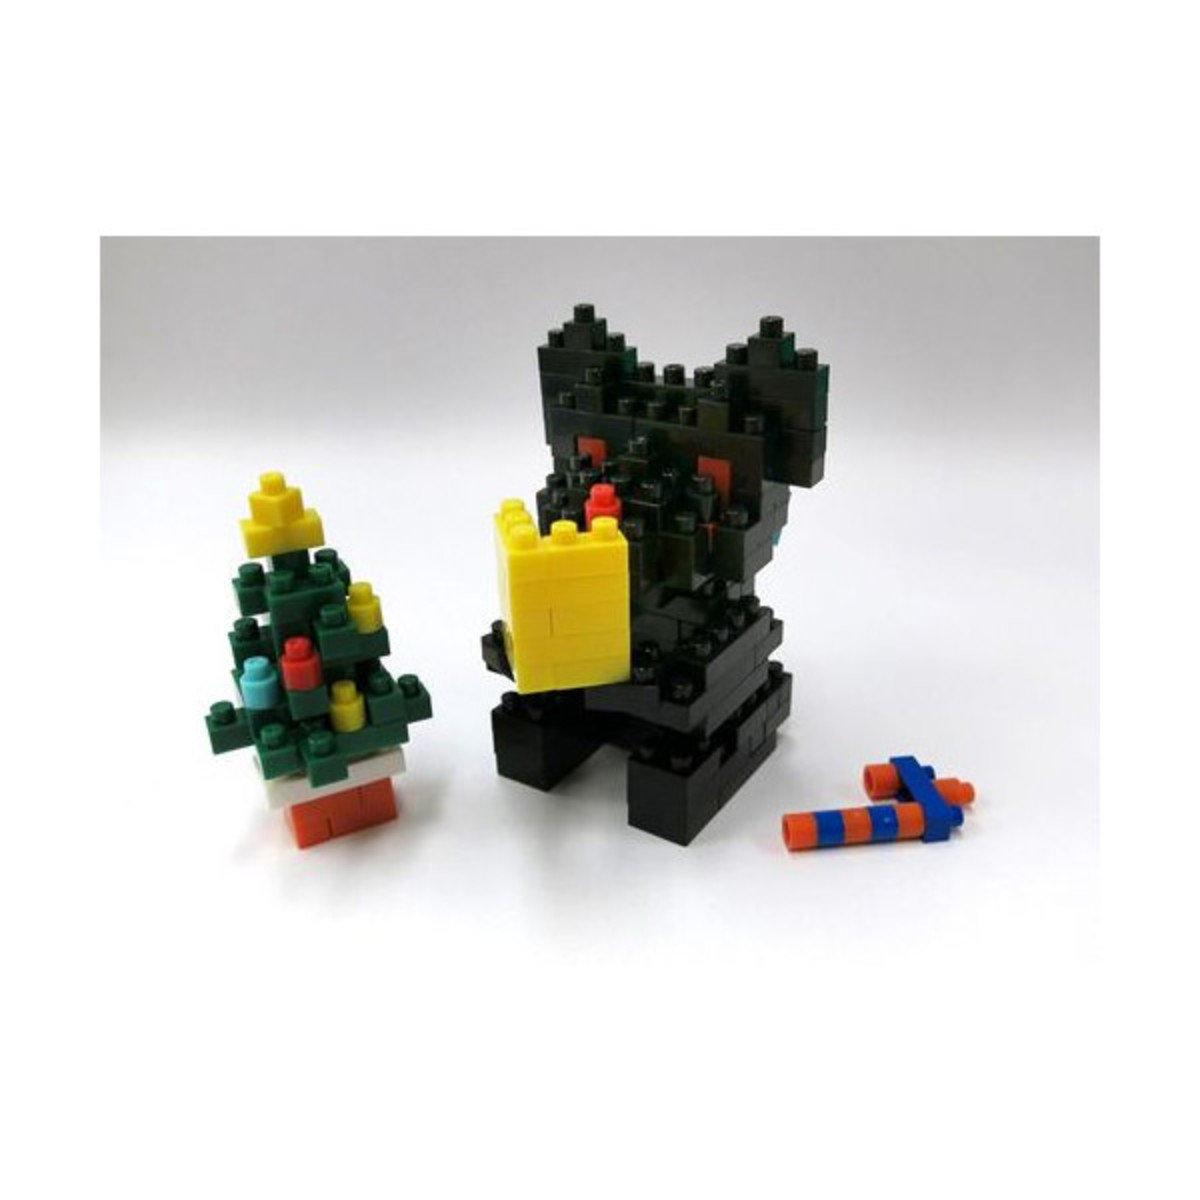 nanoblock NBGC_006 Merry Christmas